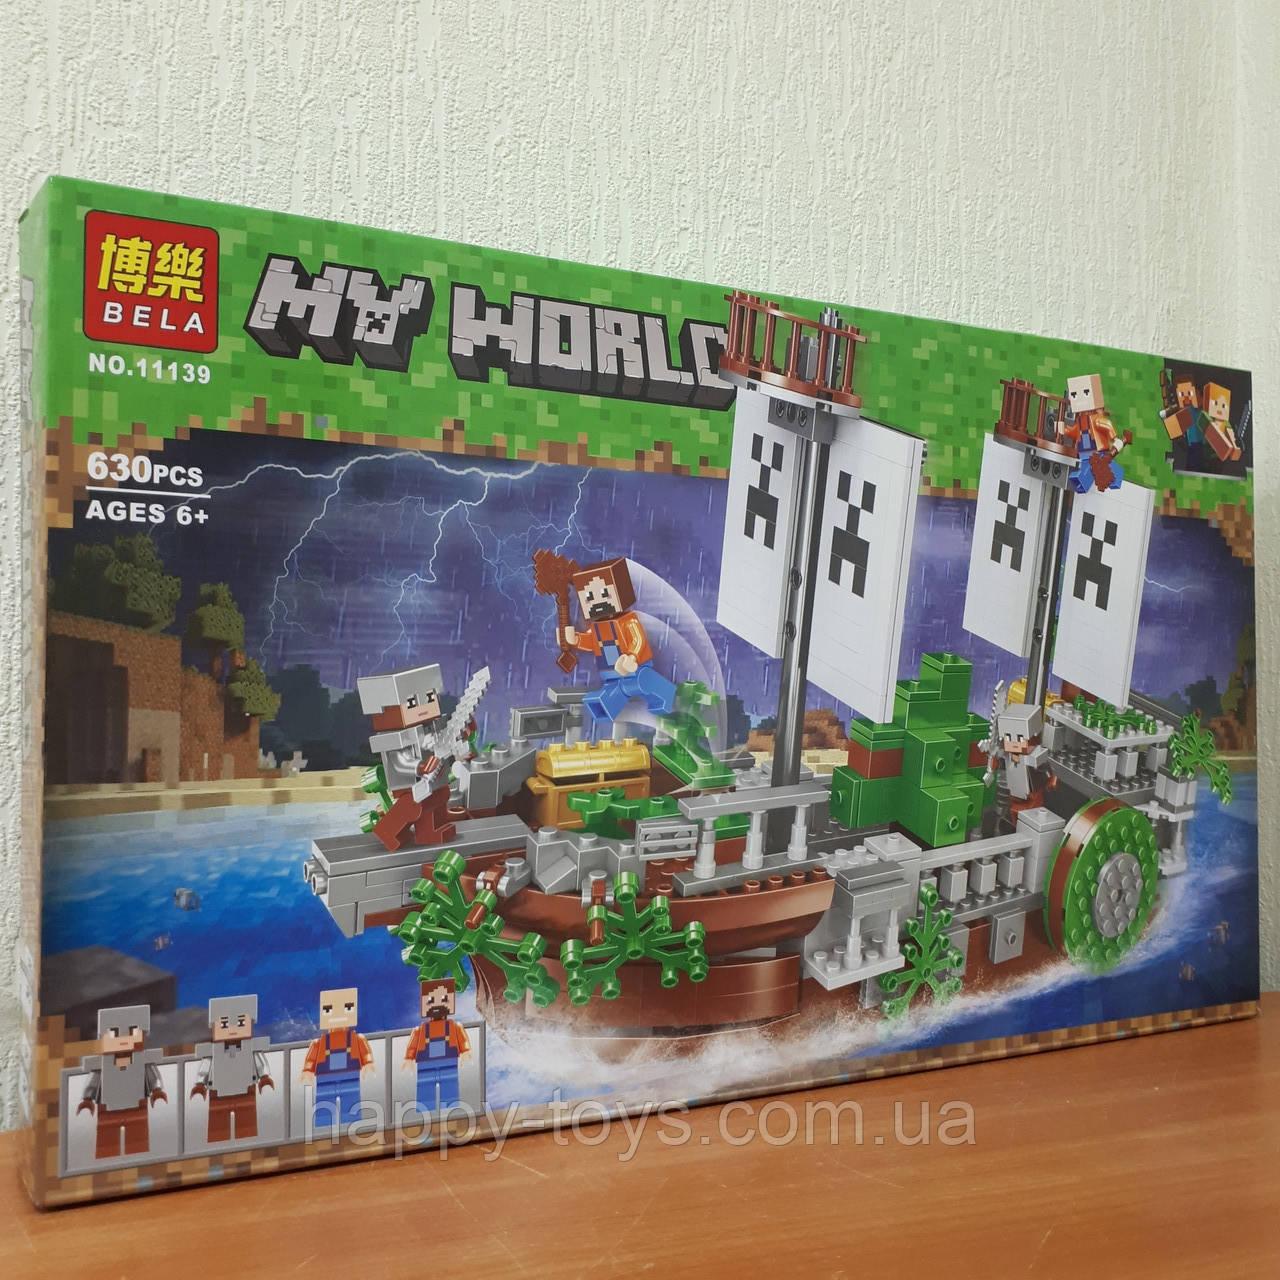 Конструктор Minecraft Bela 11139 Майнкрафт Битва на реке My World 630 деталей